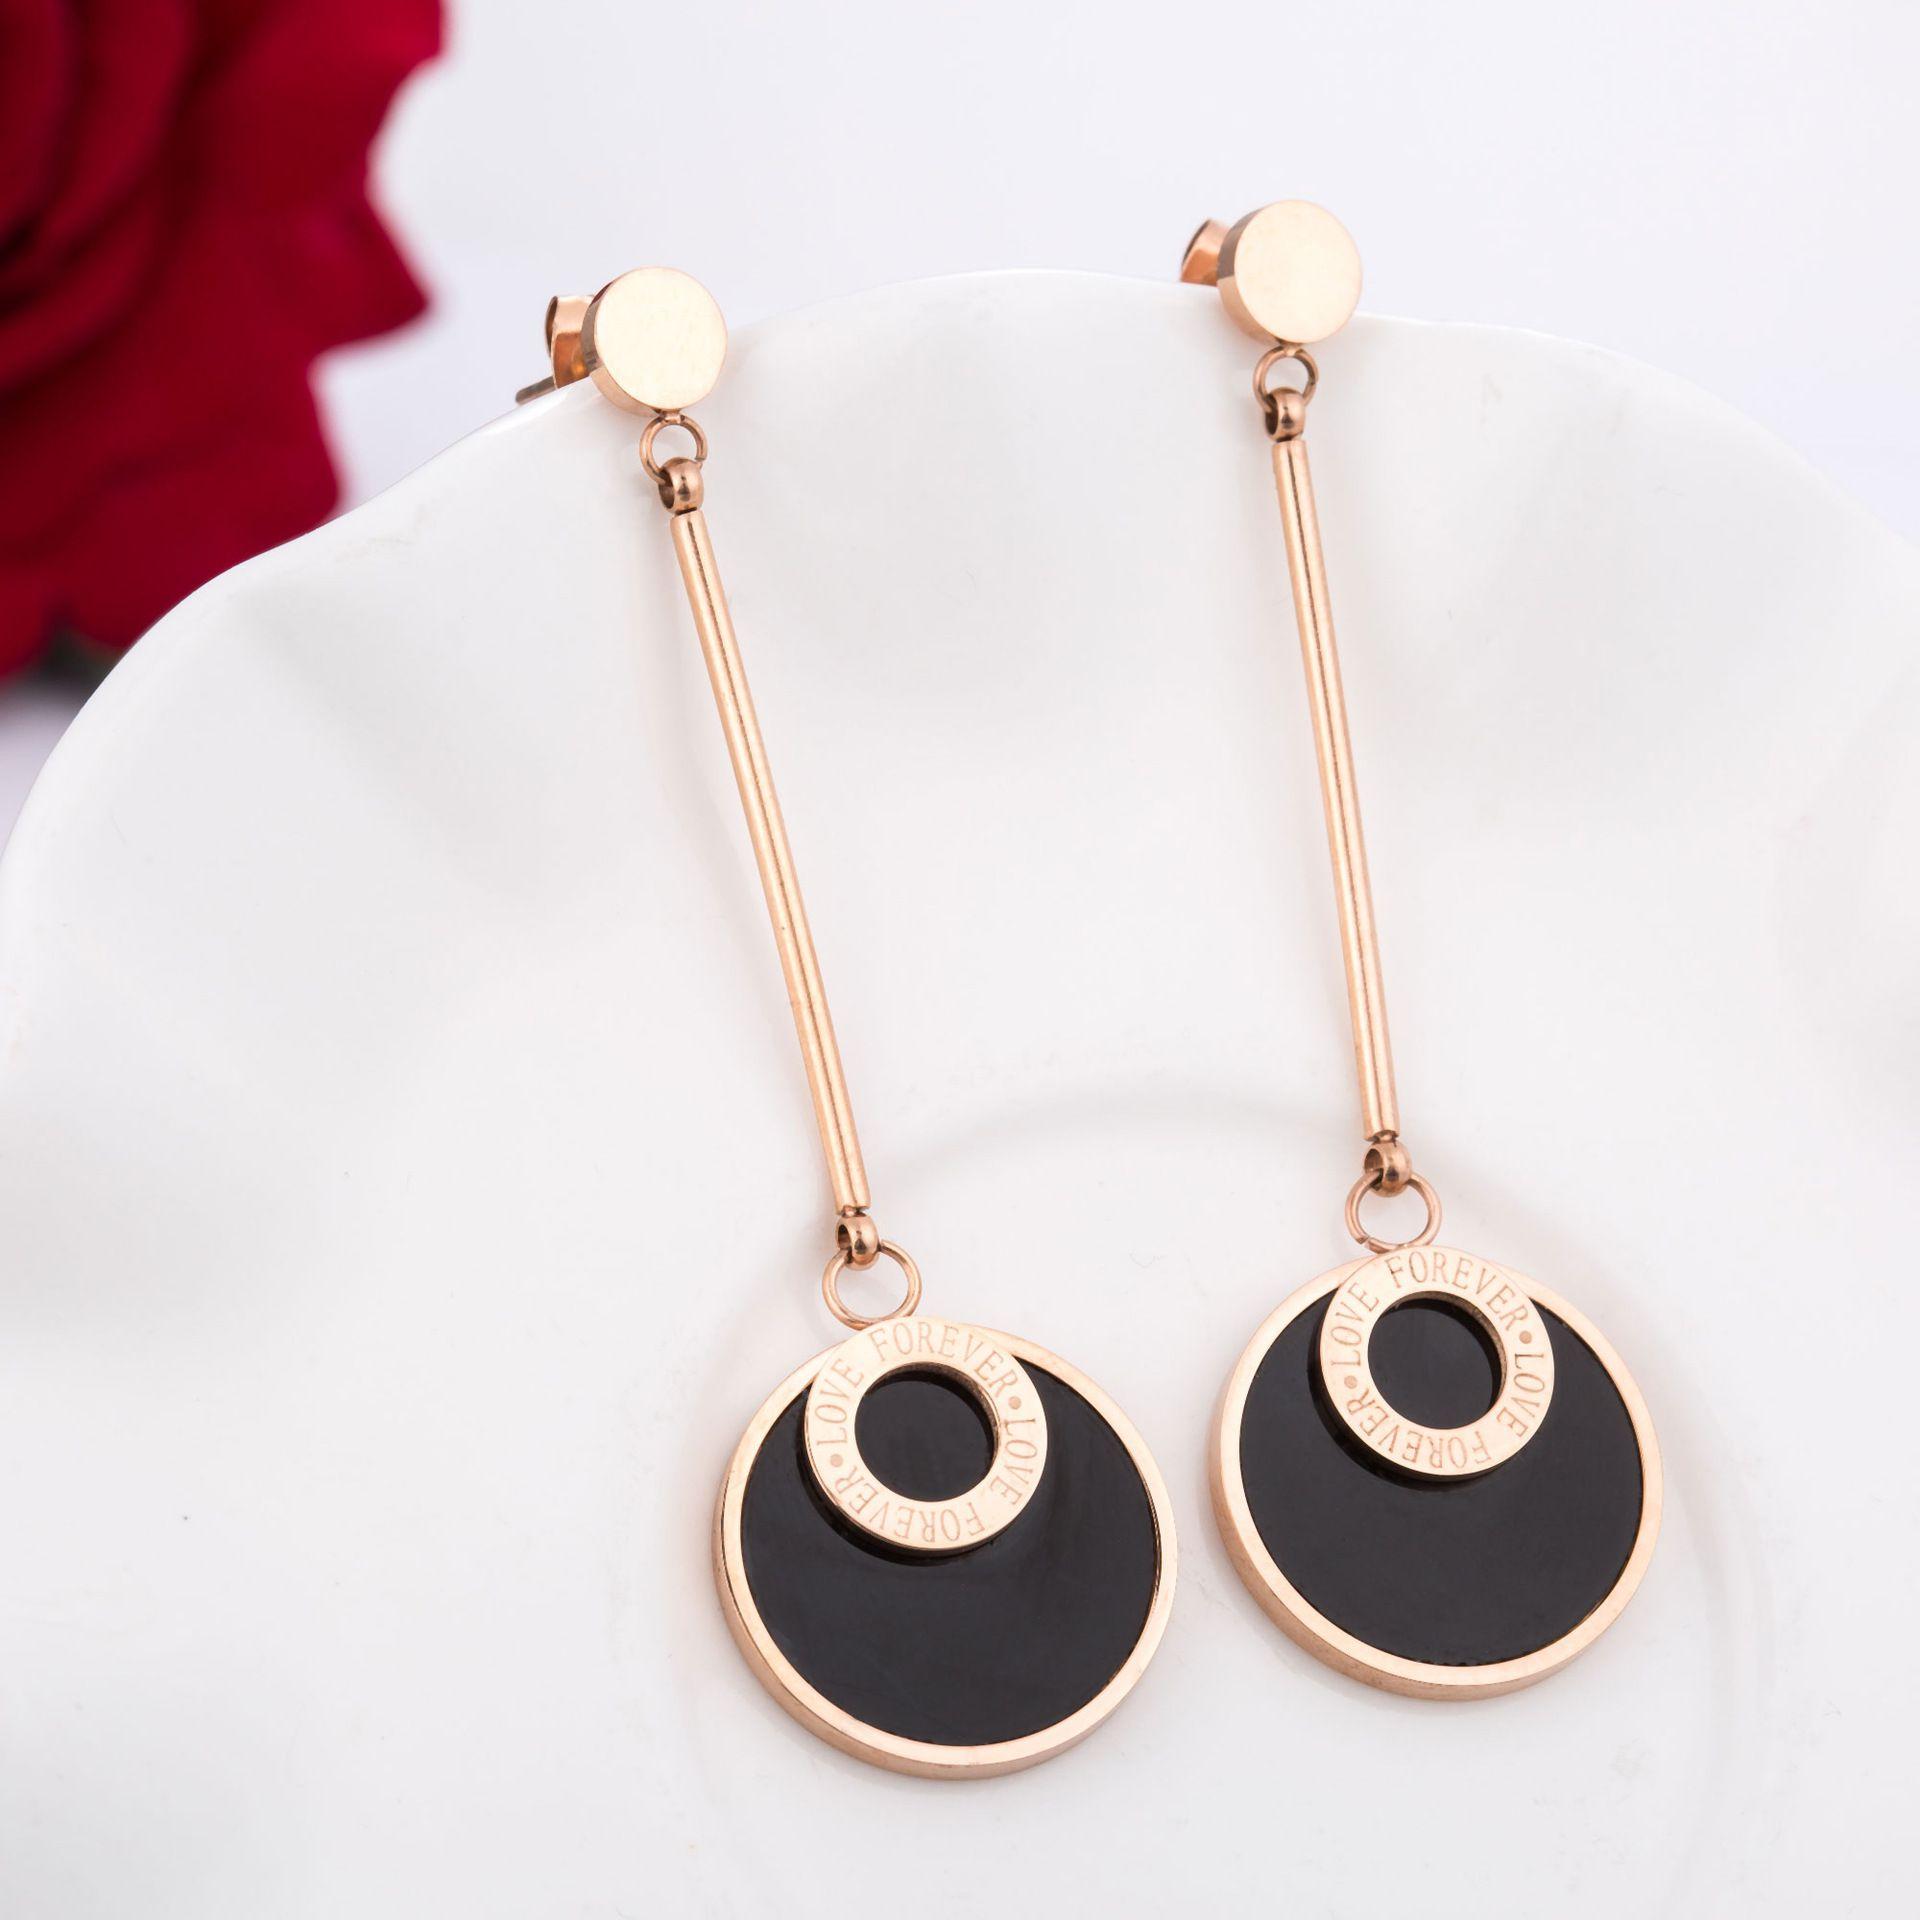 Levaso Fashion Earrings Ear Studs Titanium Steel Jewelry Rose Gold